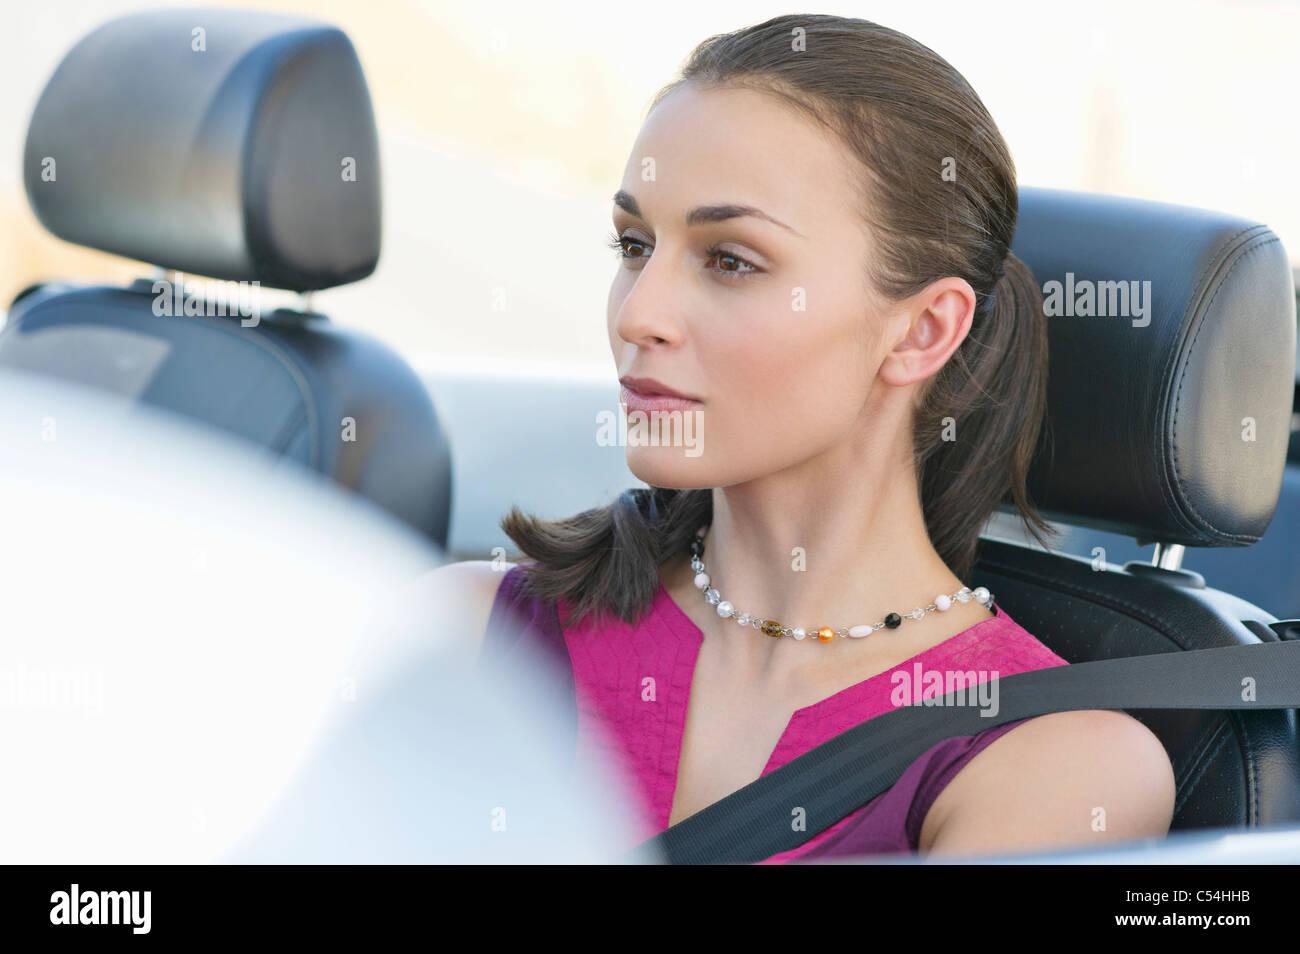 Young woman driving a convertible car - Stock Image